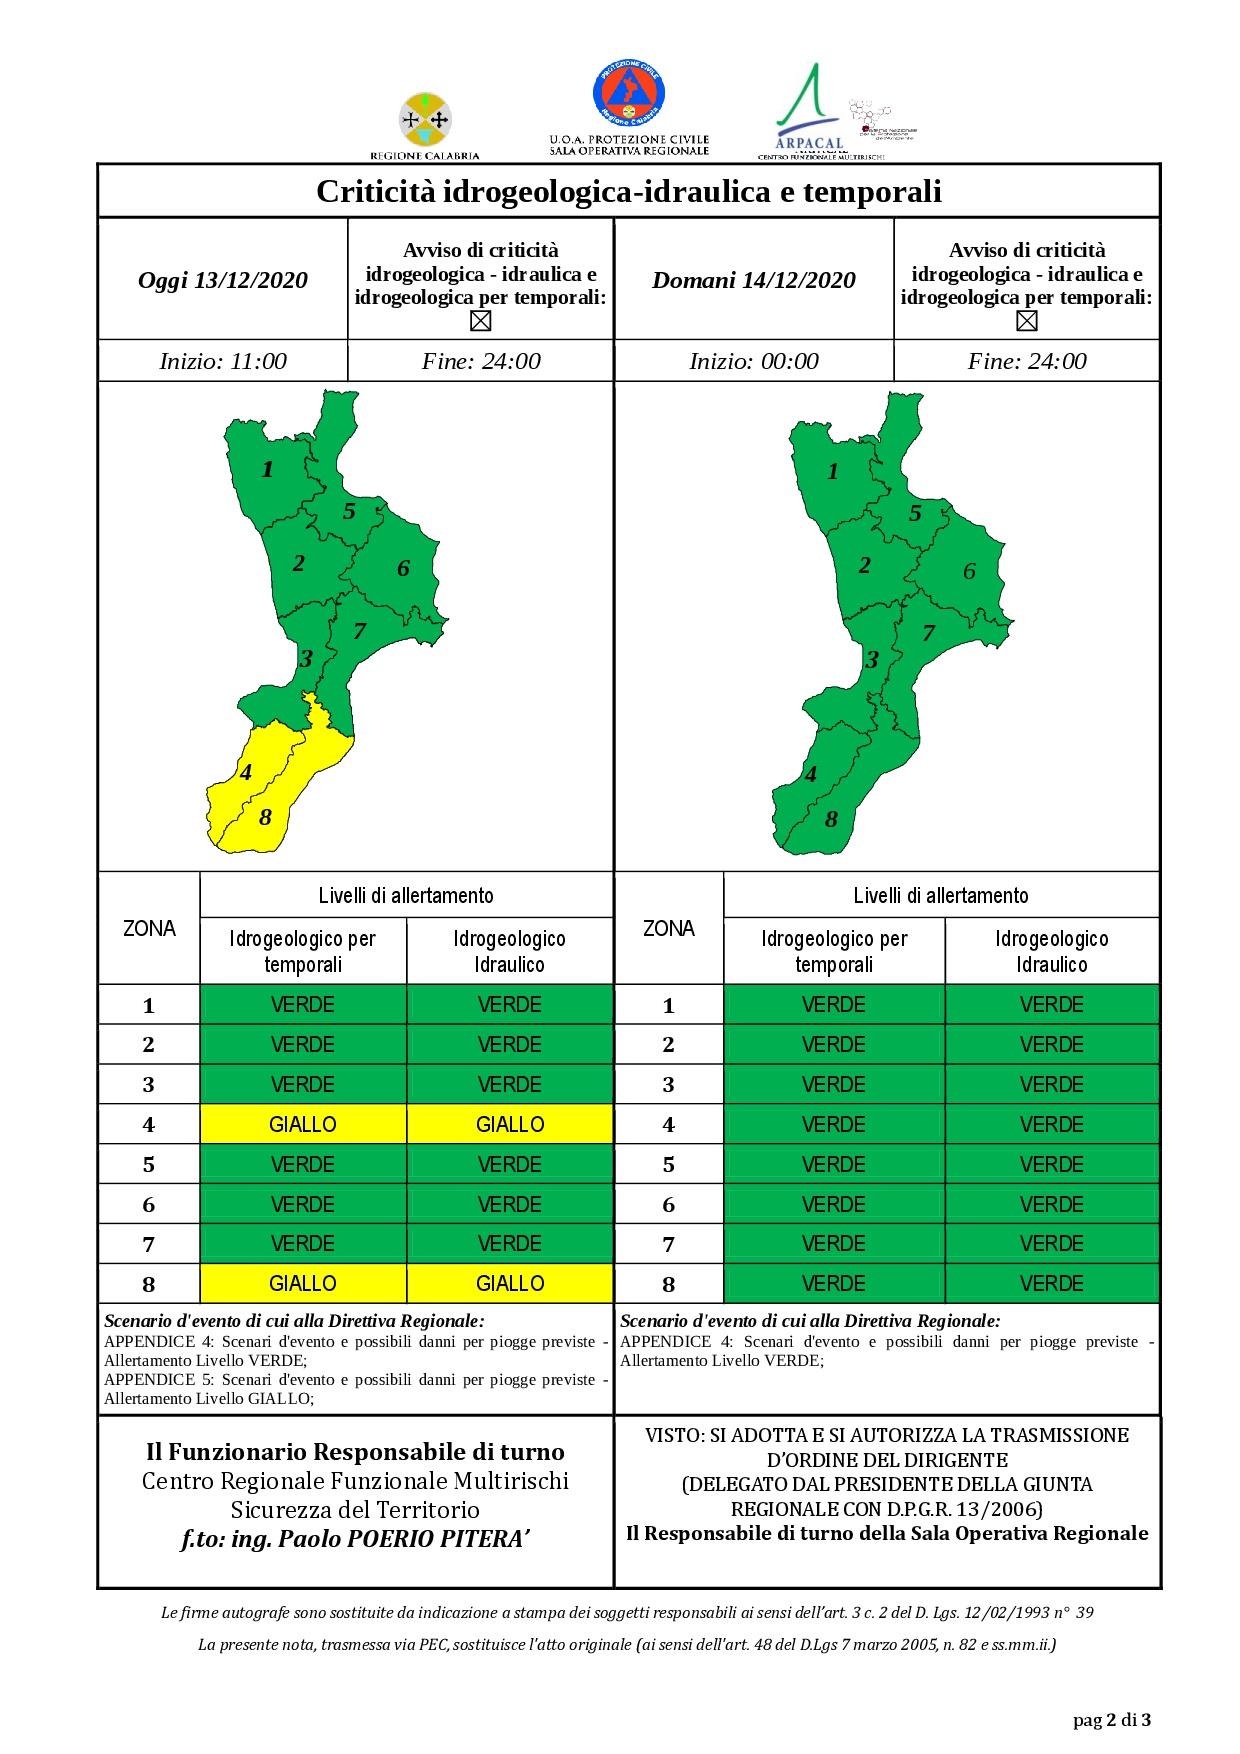 Criticità idrogeologica-idraulica e temporali in Calabria 13-12-2020